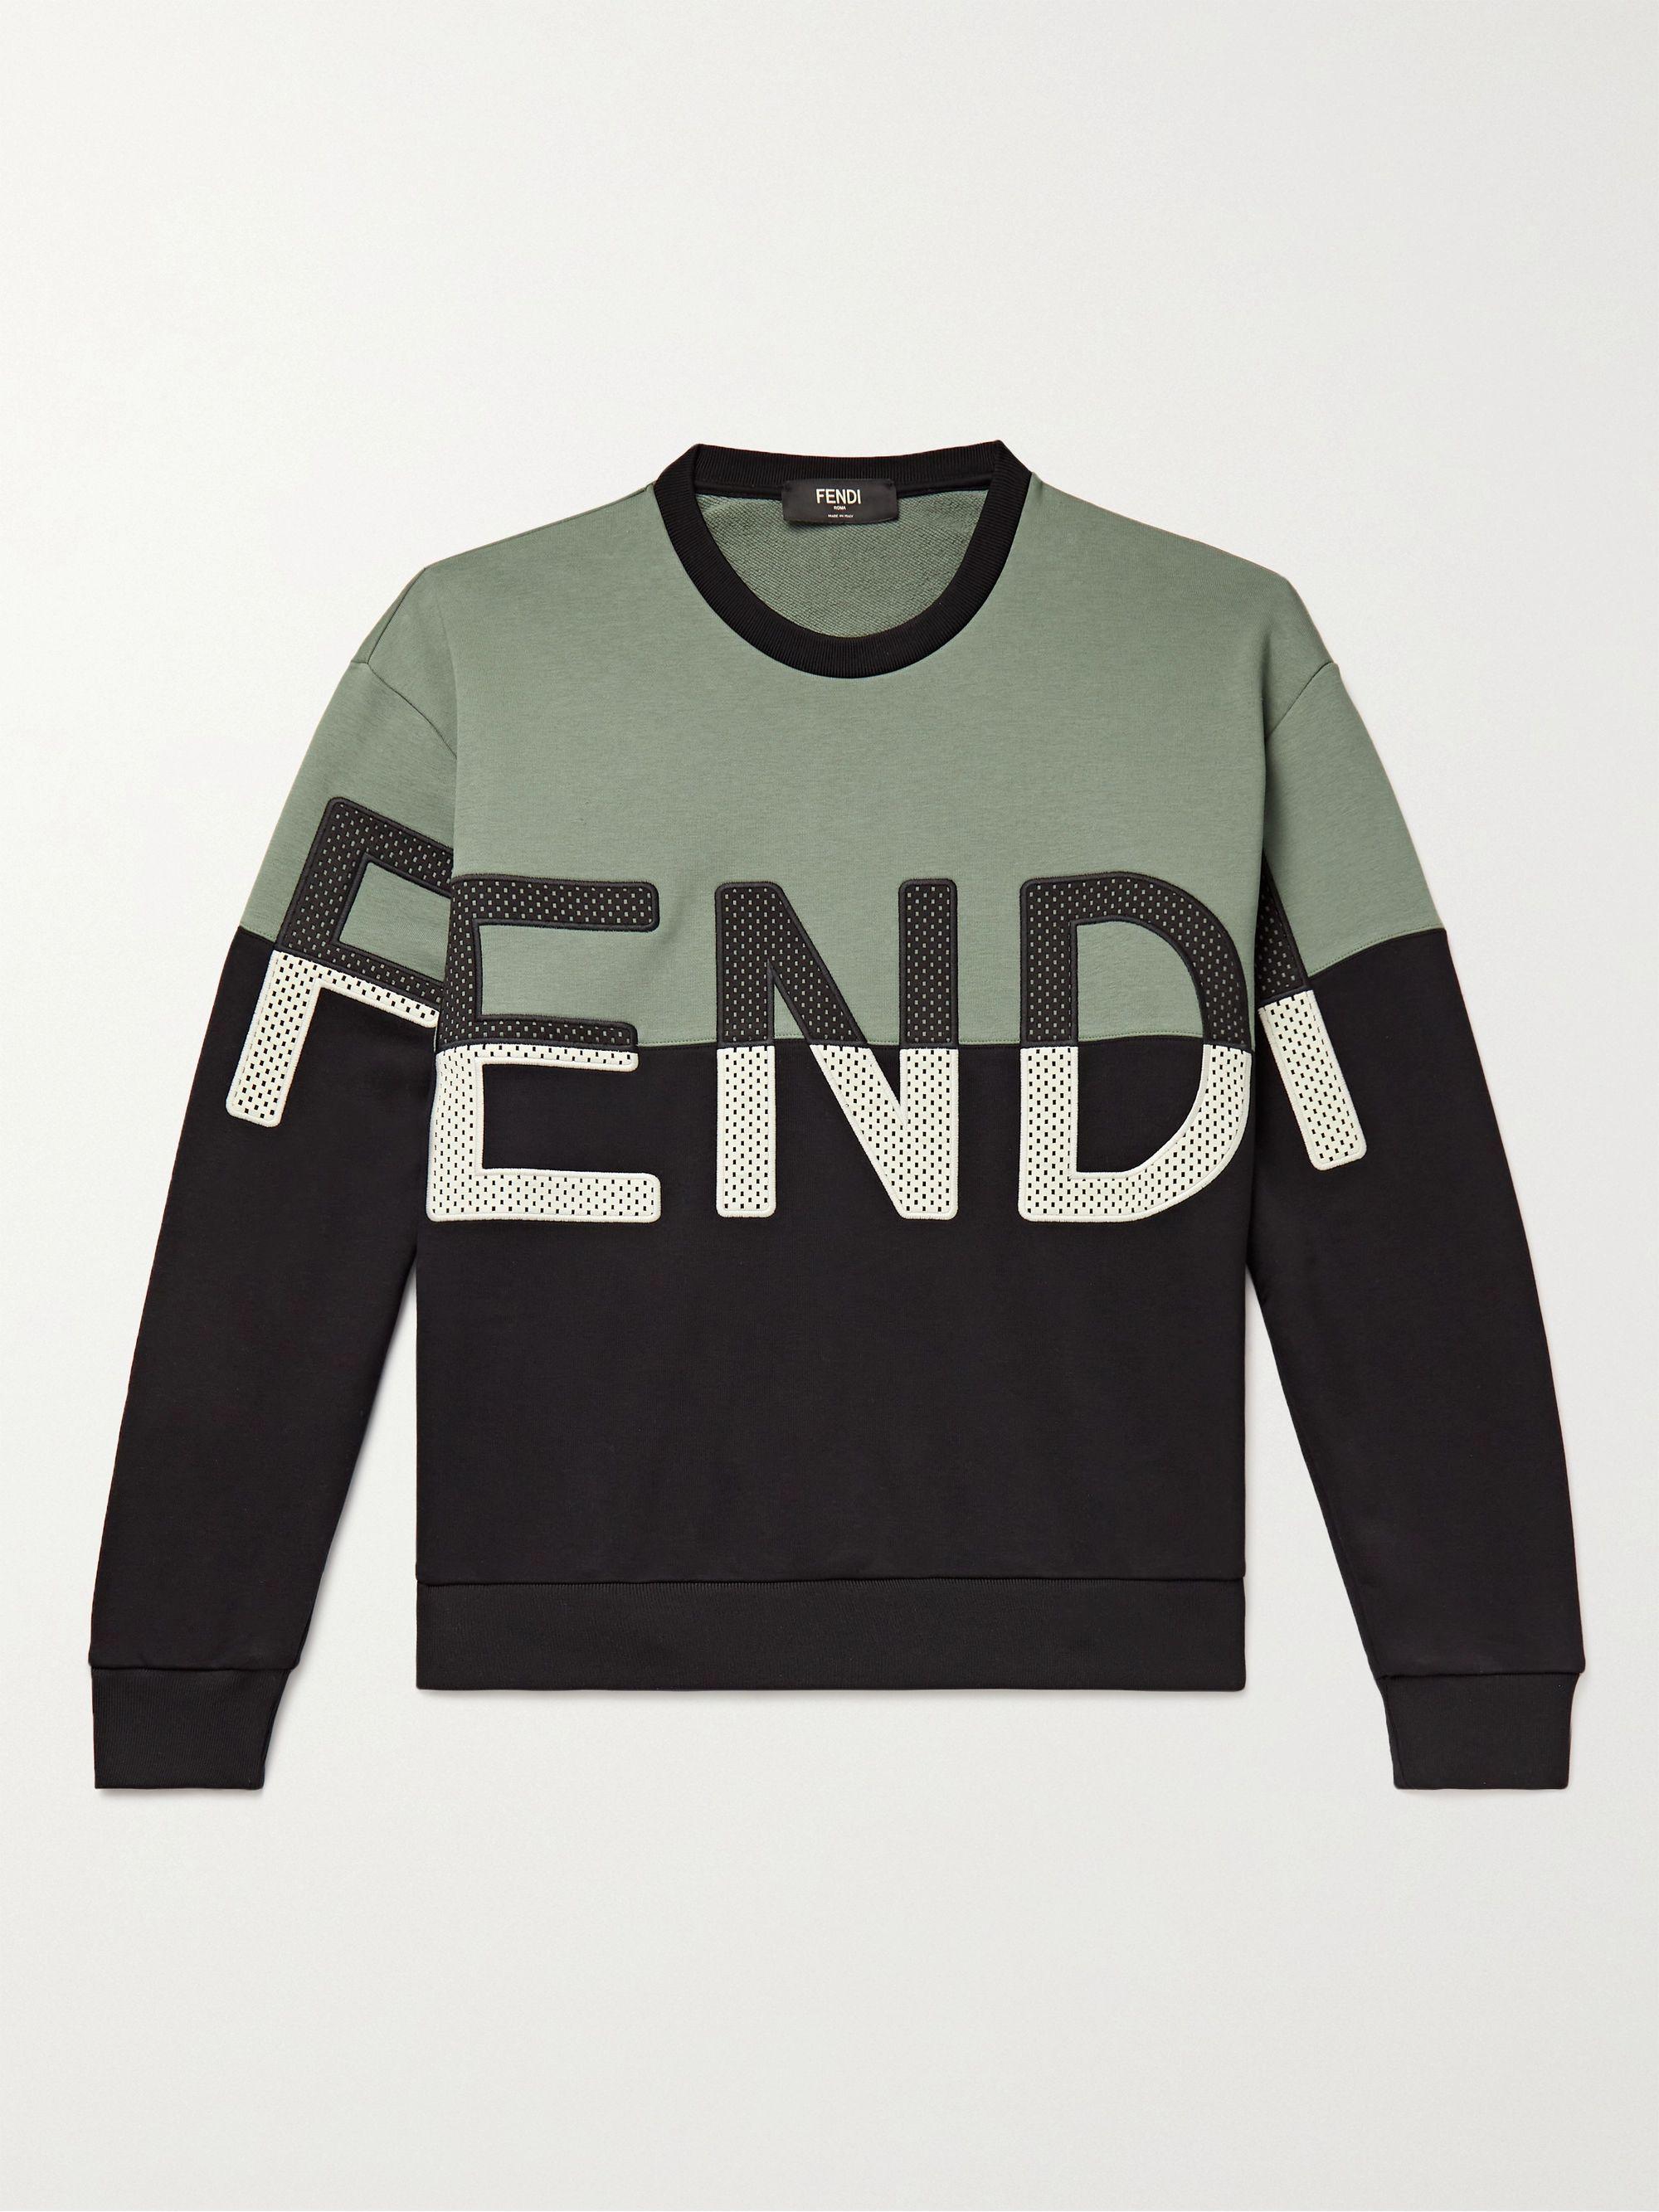 FENDI Logo-Appliqued Loopback Cotton-Blend Jersey Sweatshirt